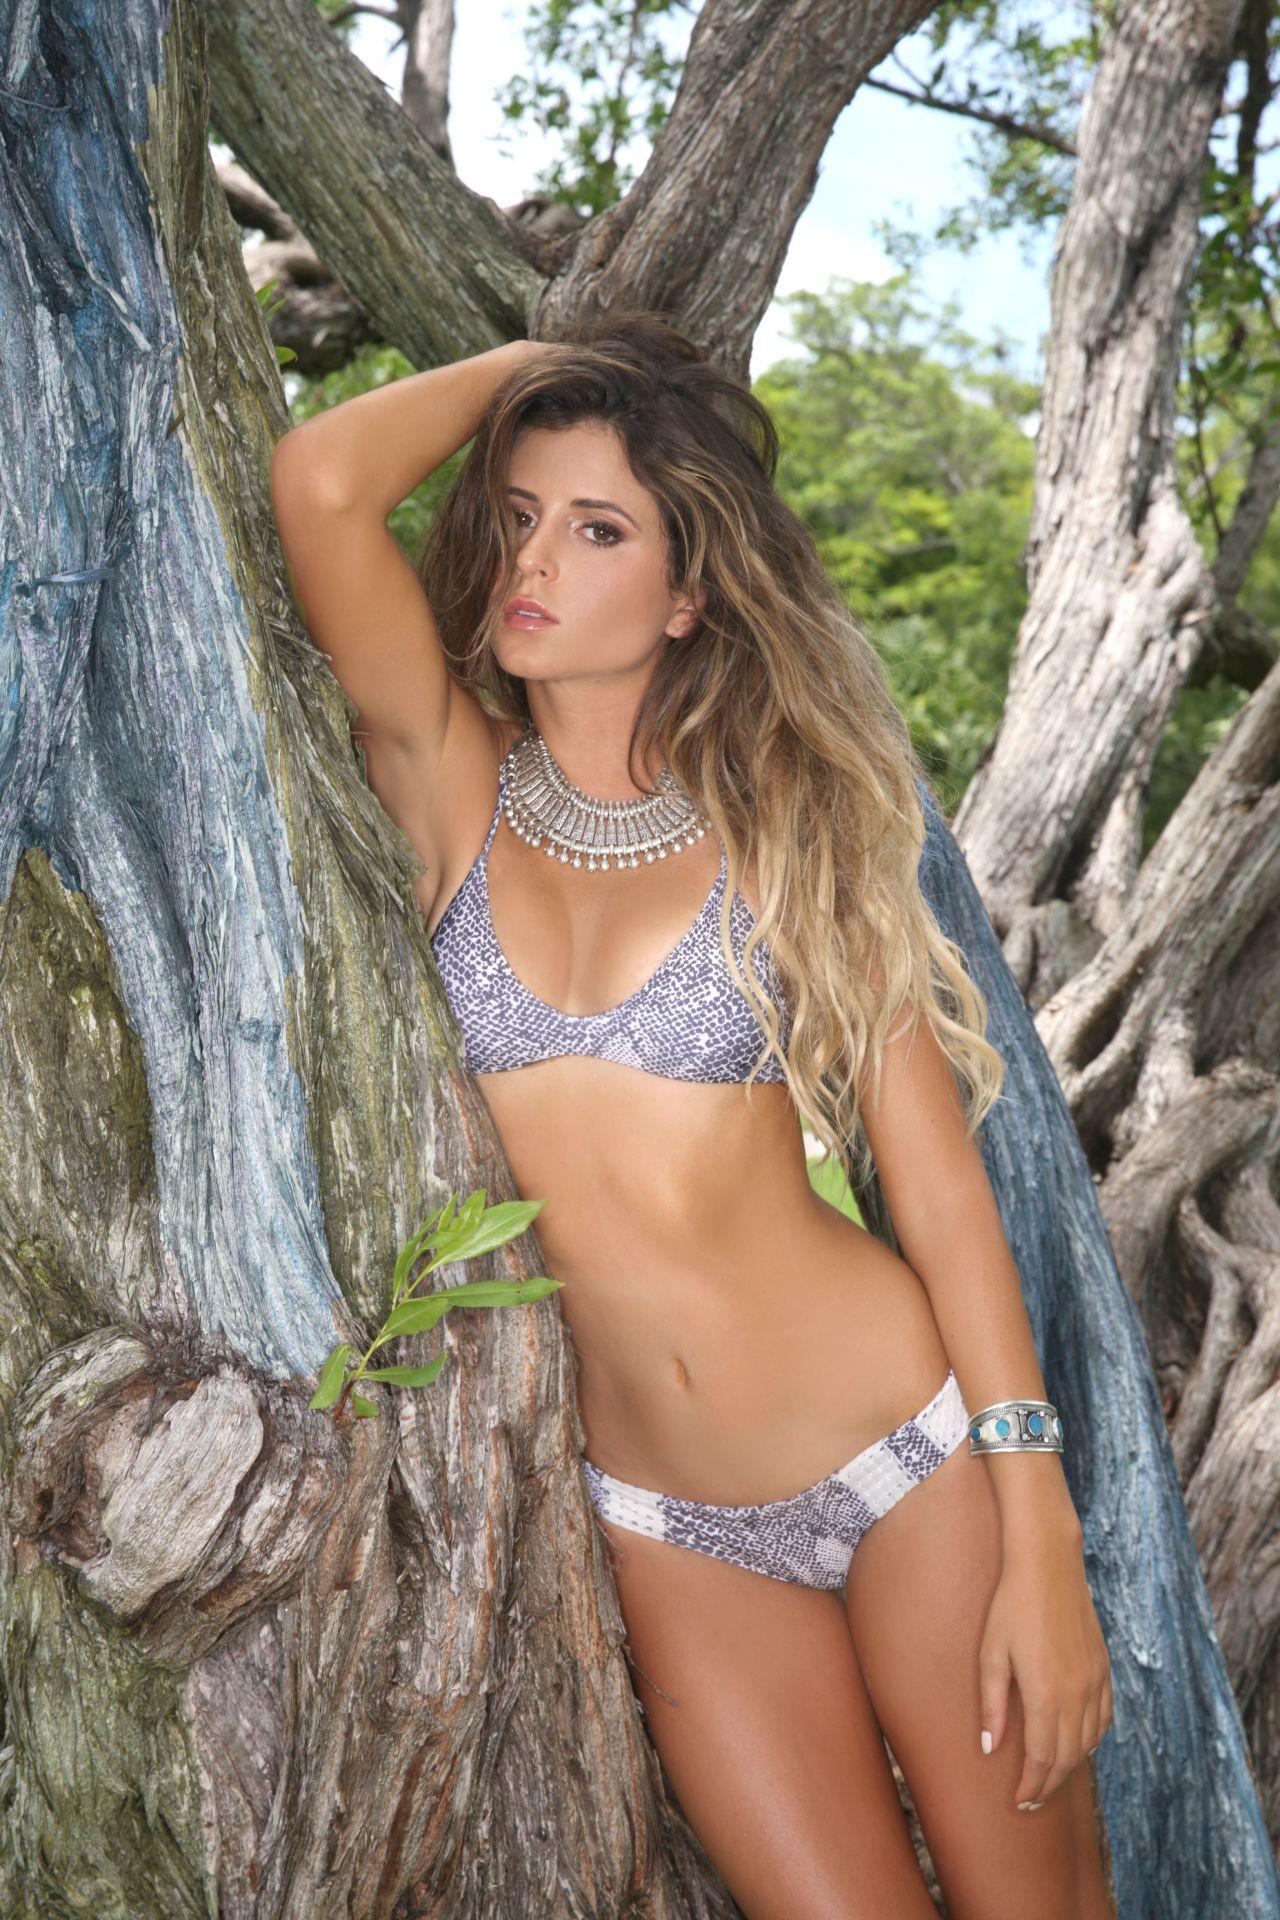 Anastasia Ashley Hot in Bikini - X Ishine365 Photoshoot